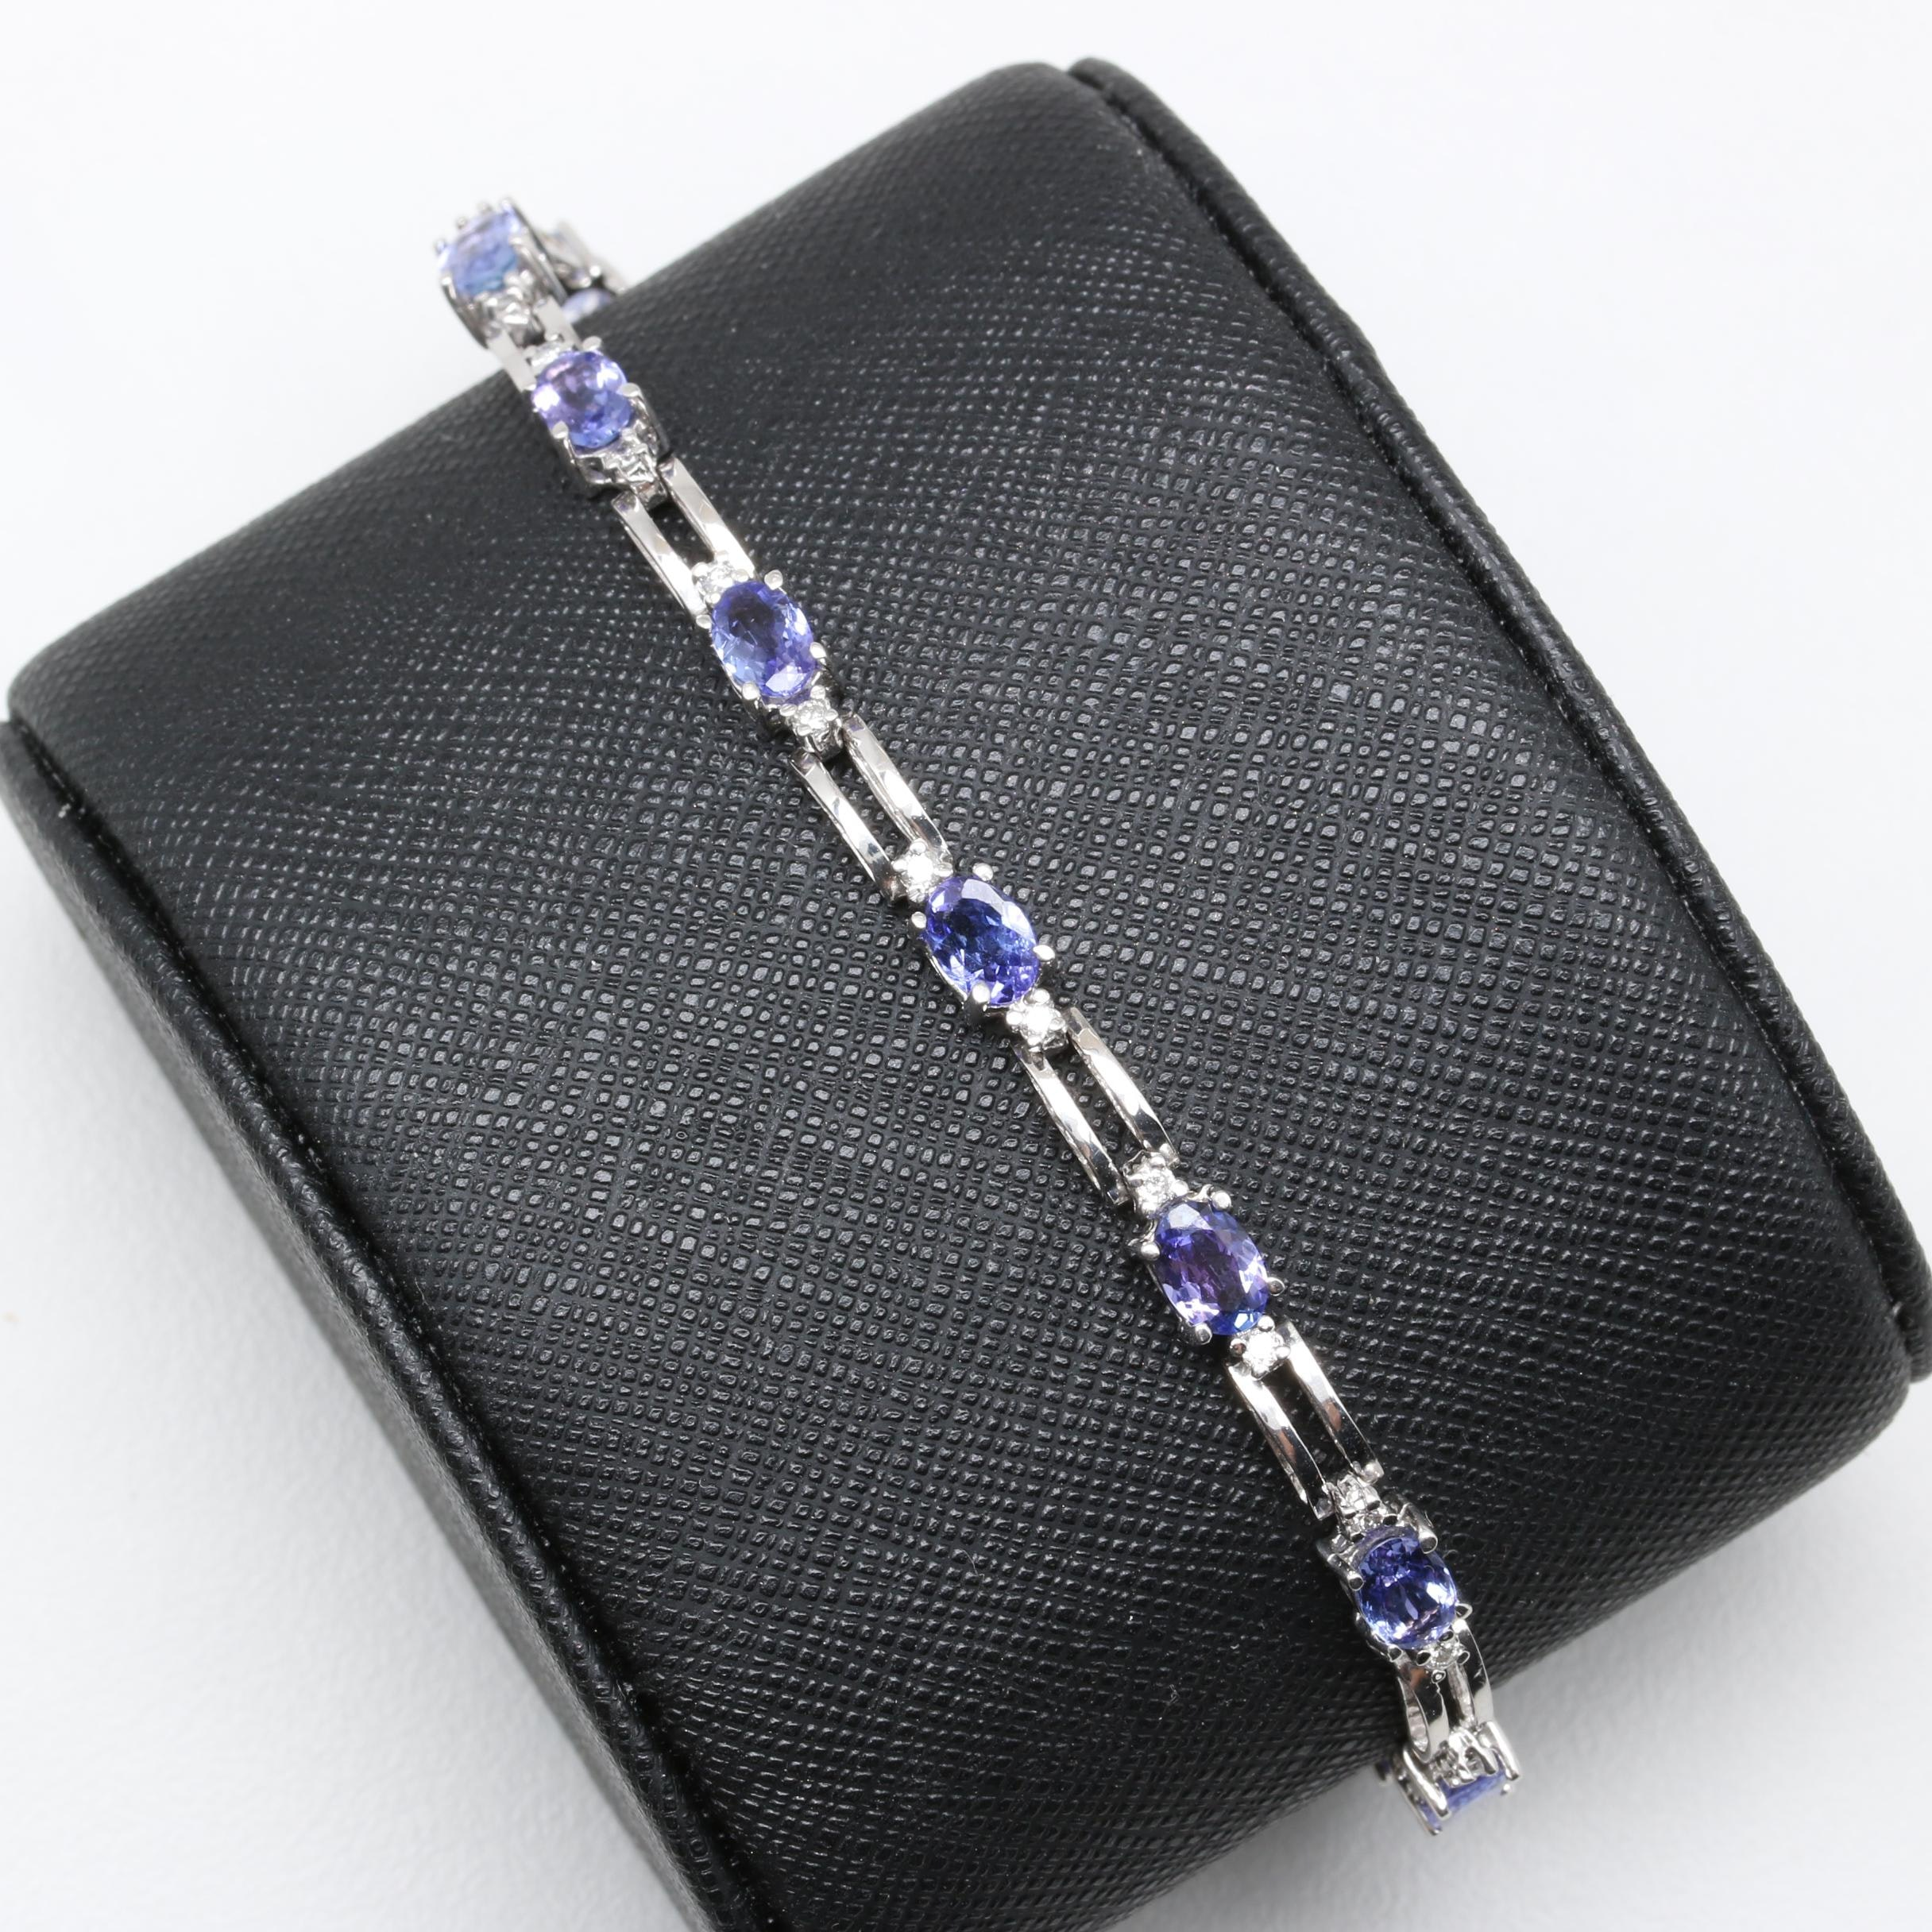 14K White Gold Tanzanite and Diamond Link Bracelet